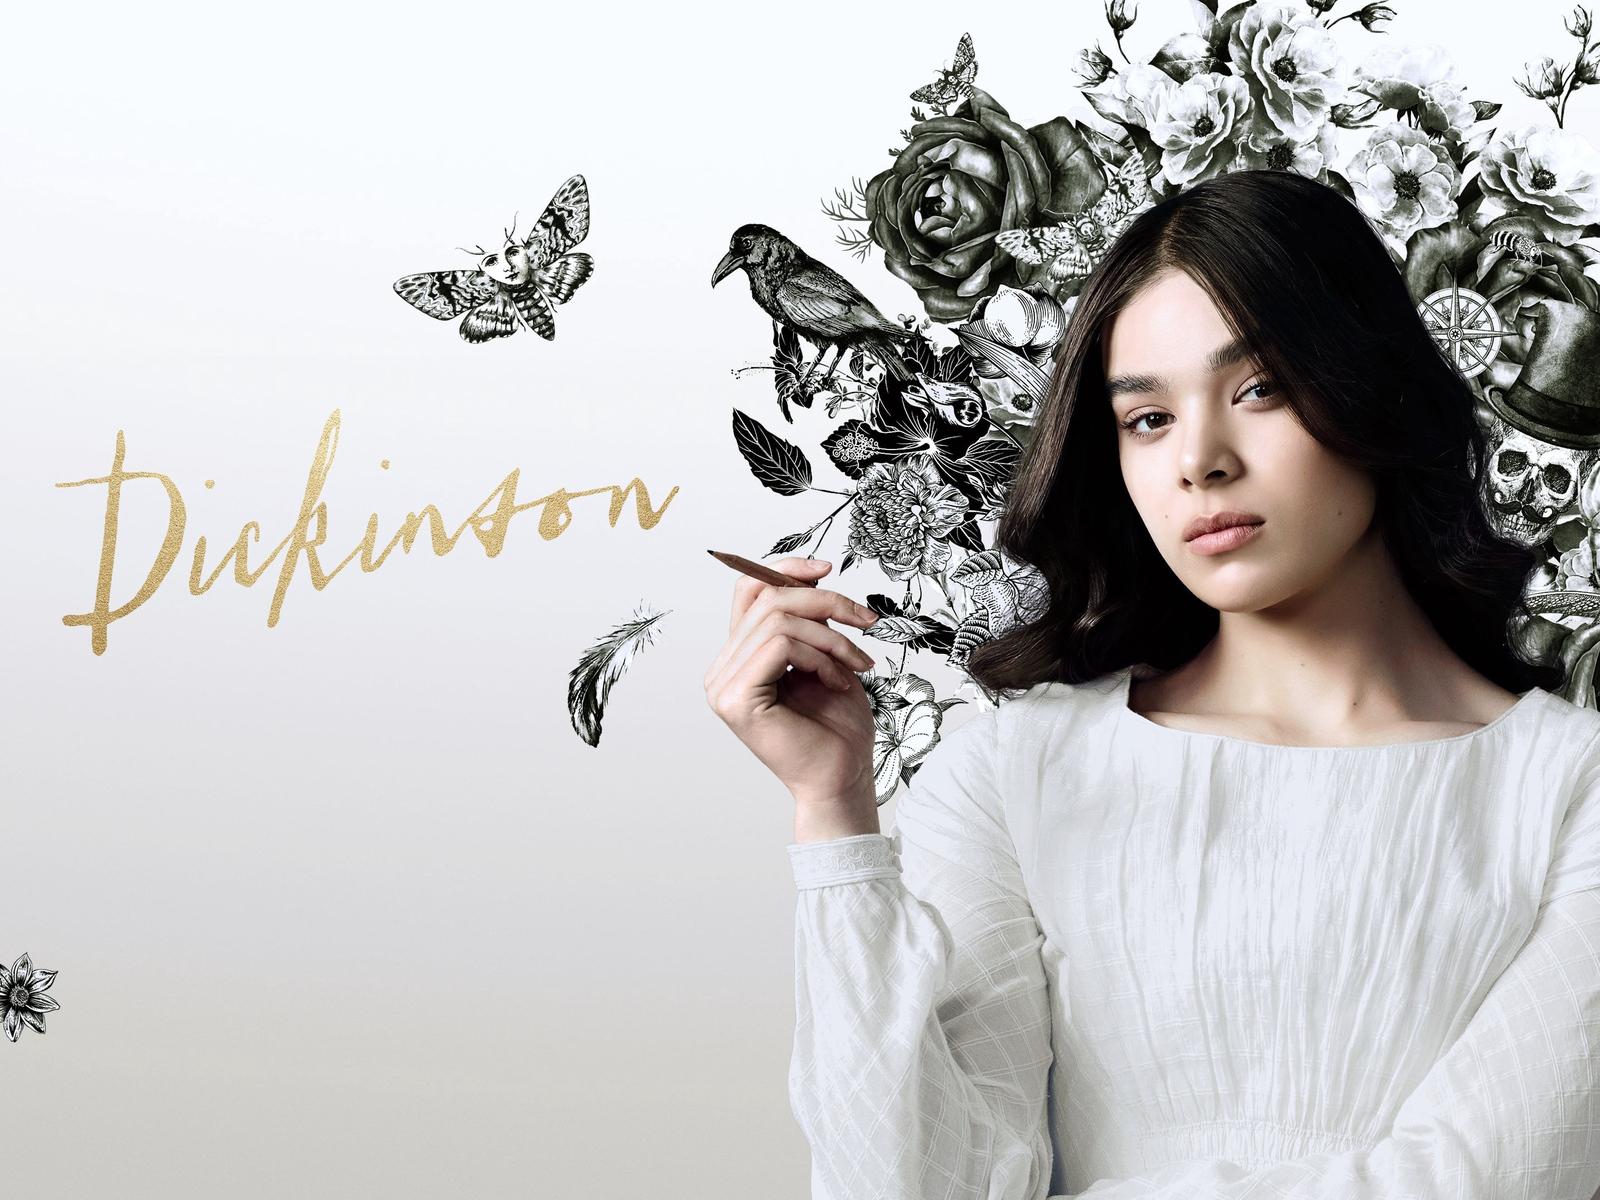 dickinson-apple-tv-series-ft.jpg